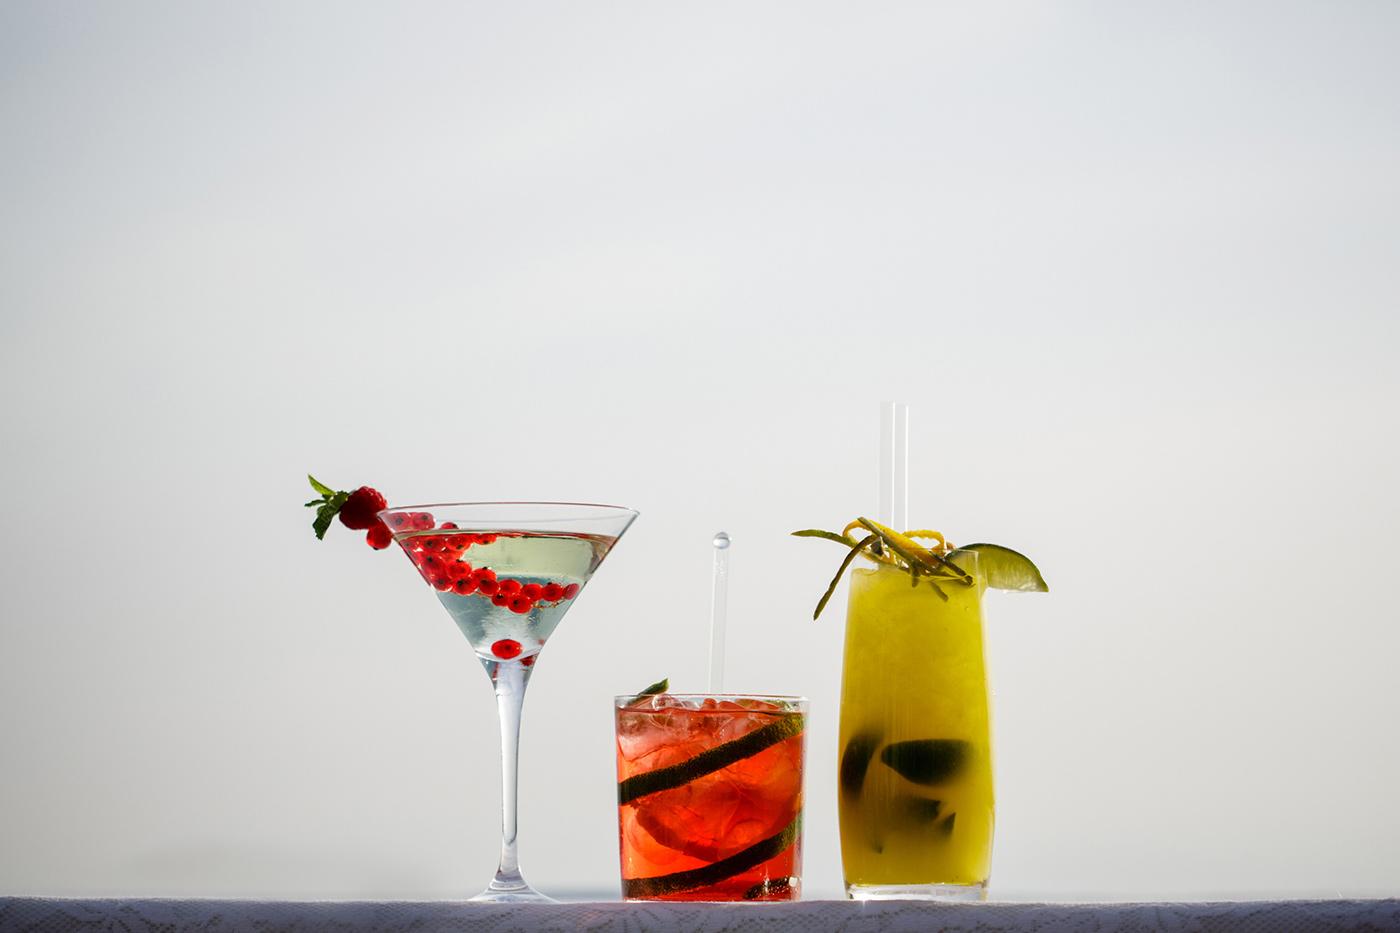 joee-wong-belmond-hotels-italy-food1a